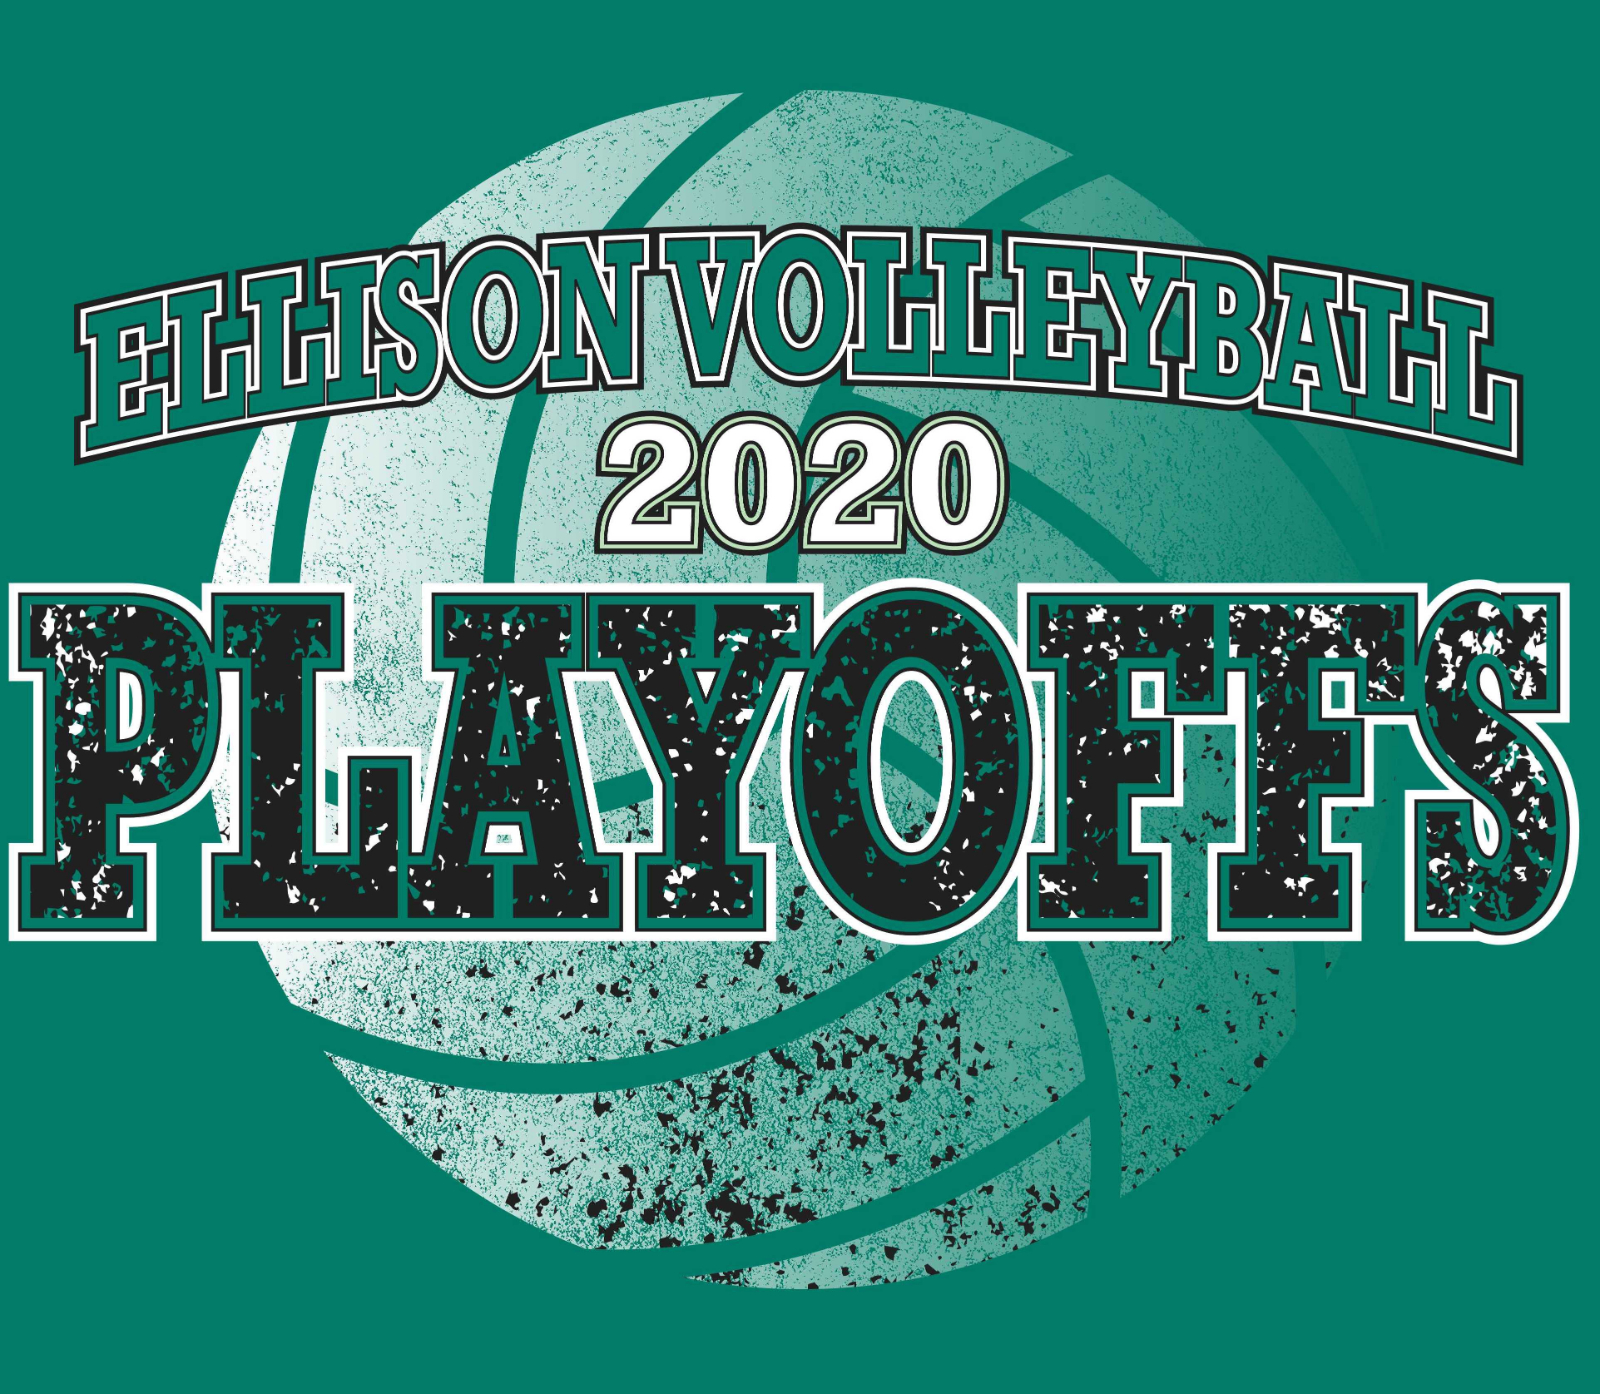 Ellison Volleyball 2020 Playoff Shirts